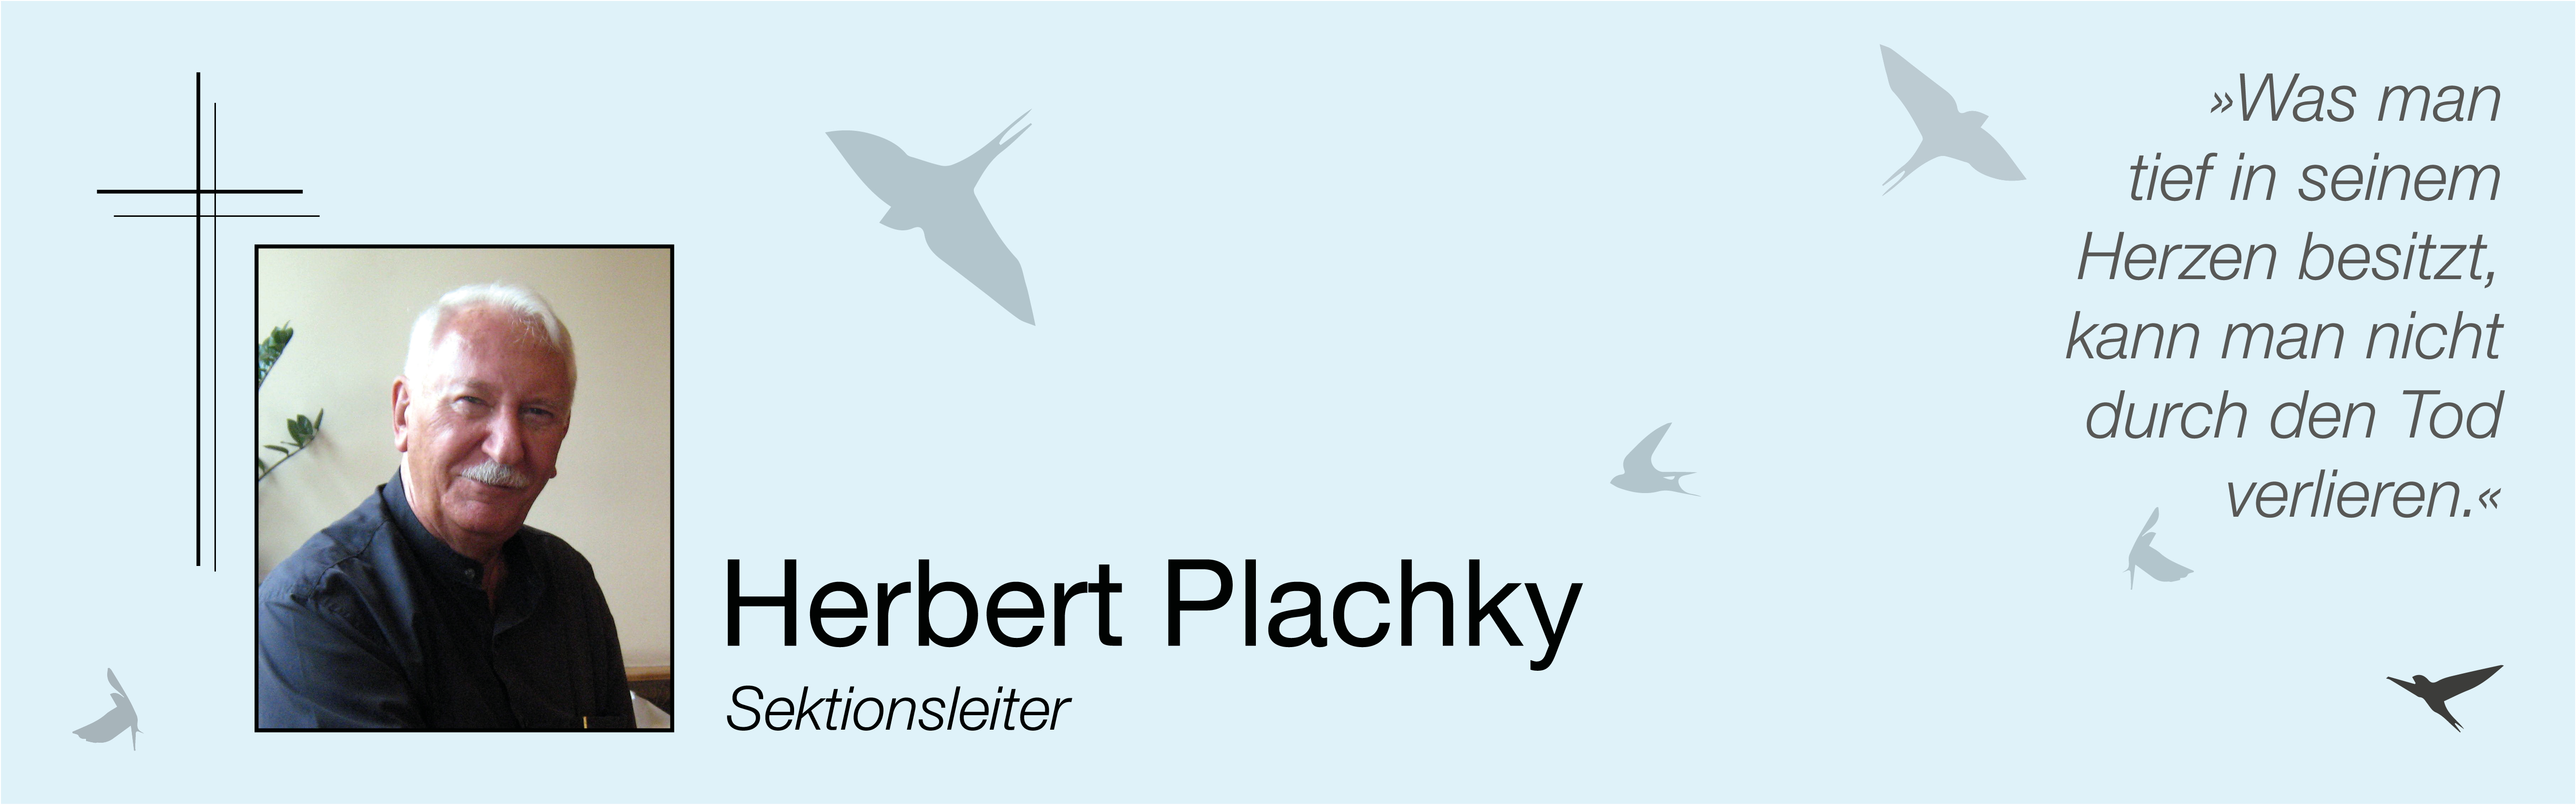 Nachruf Herbert Plachky